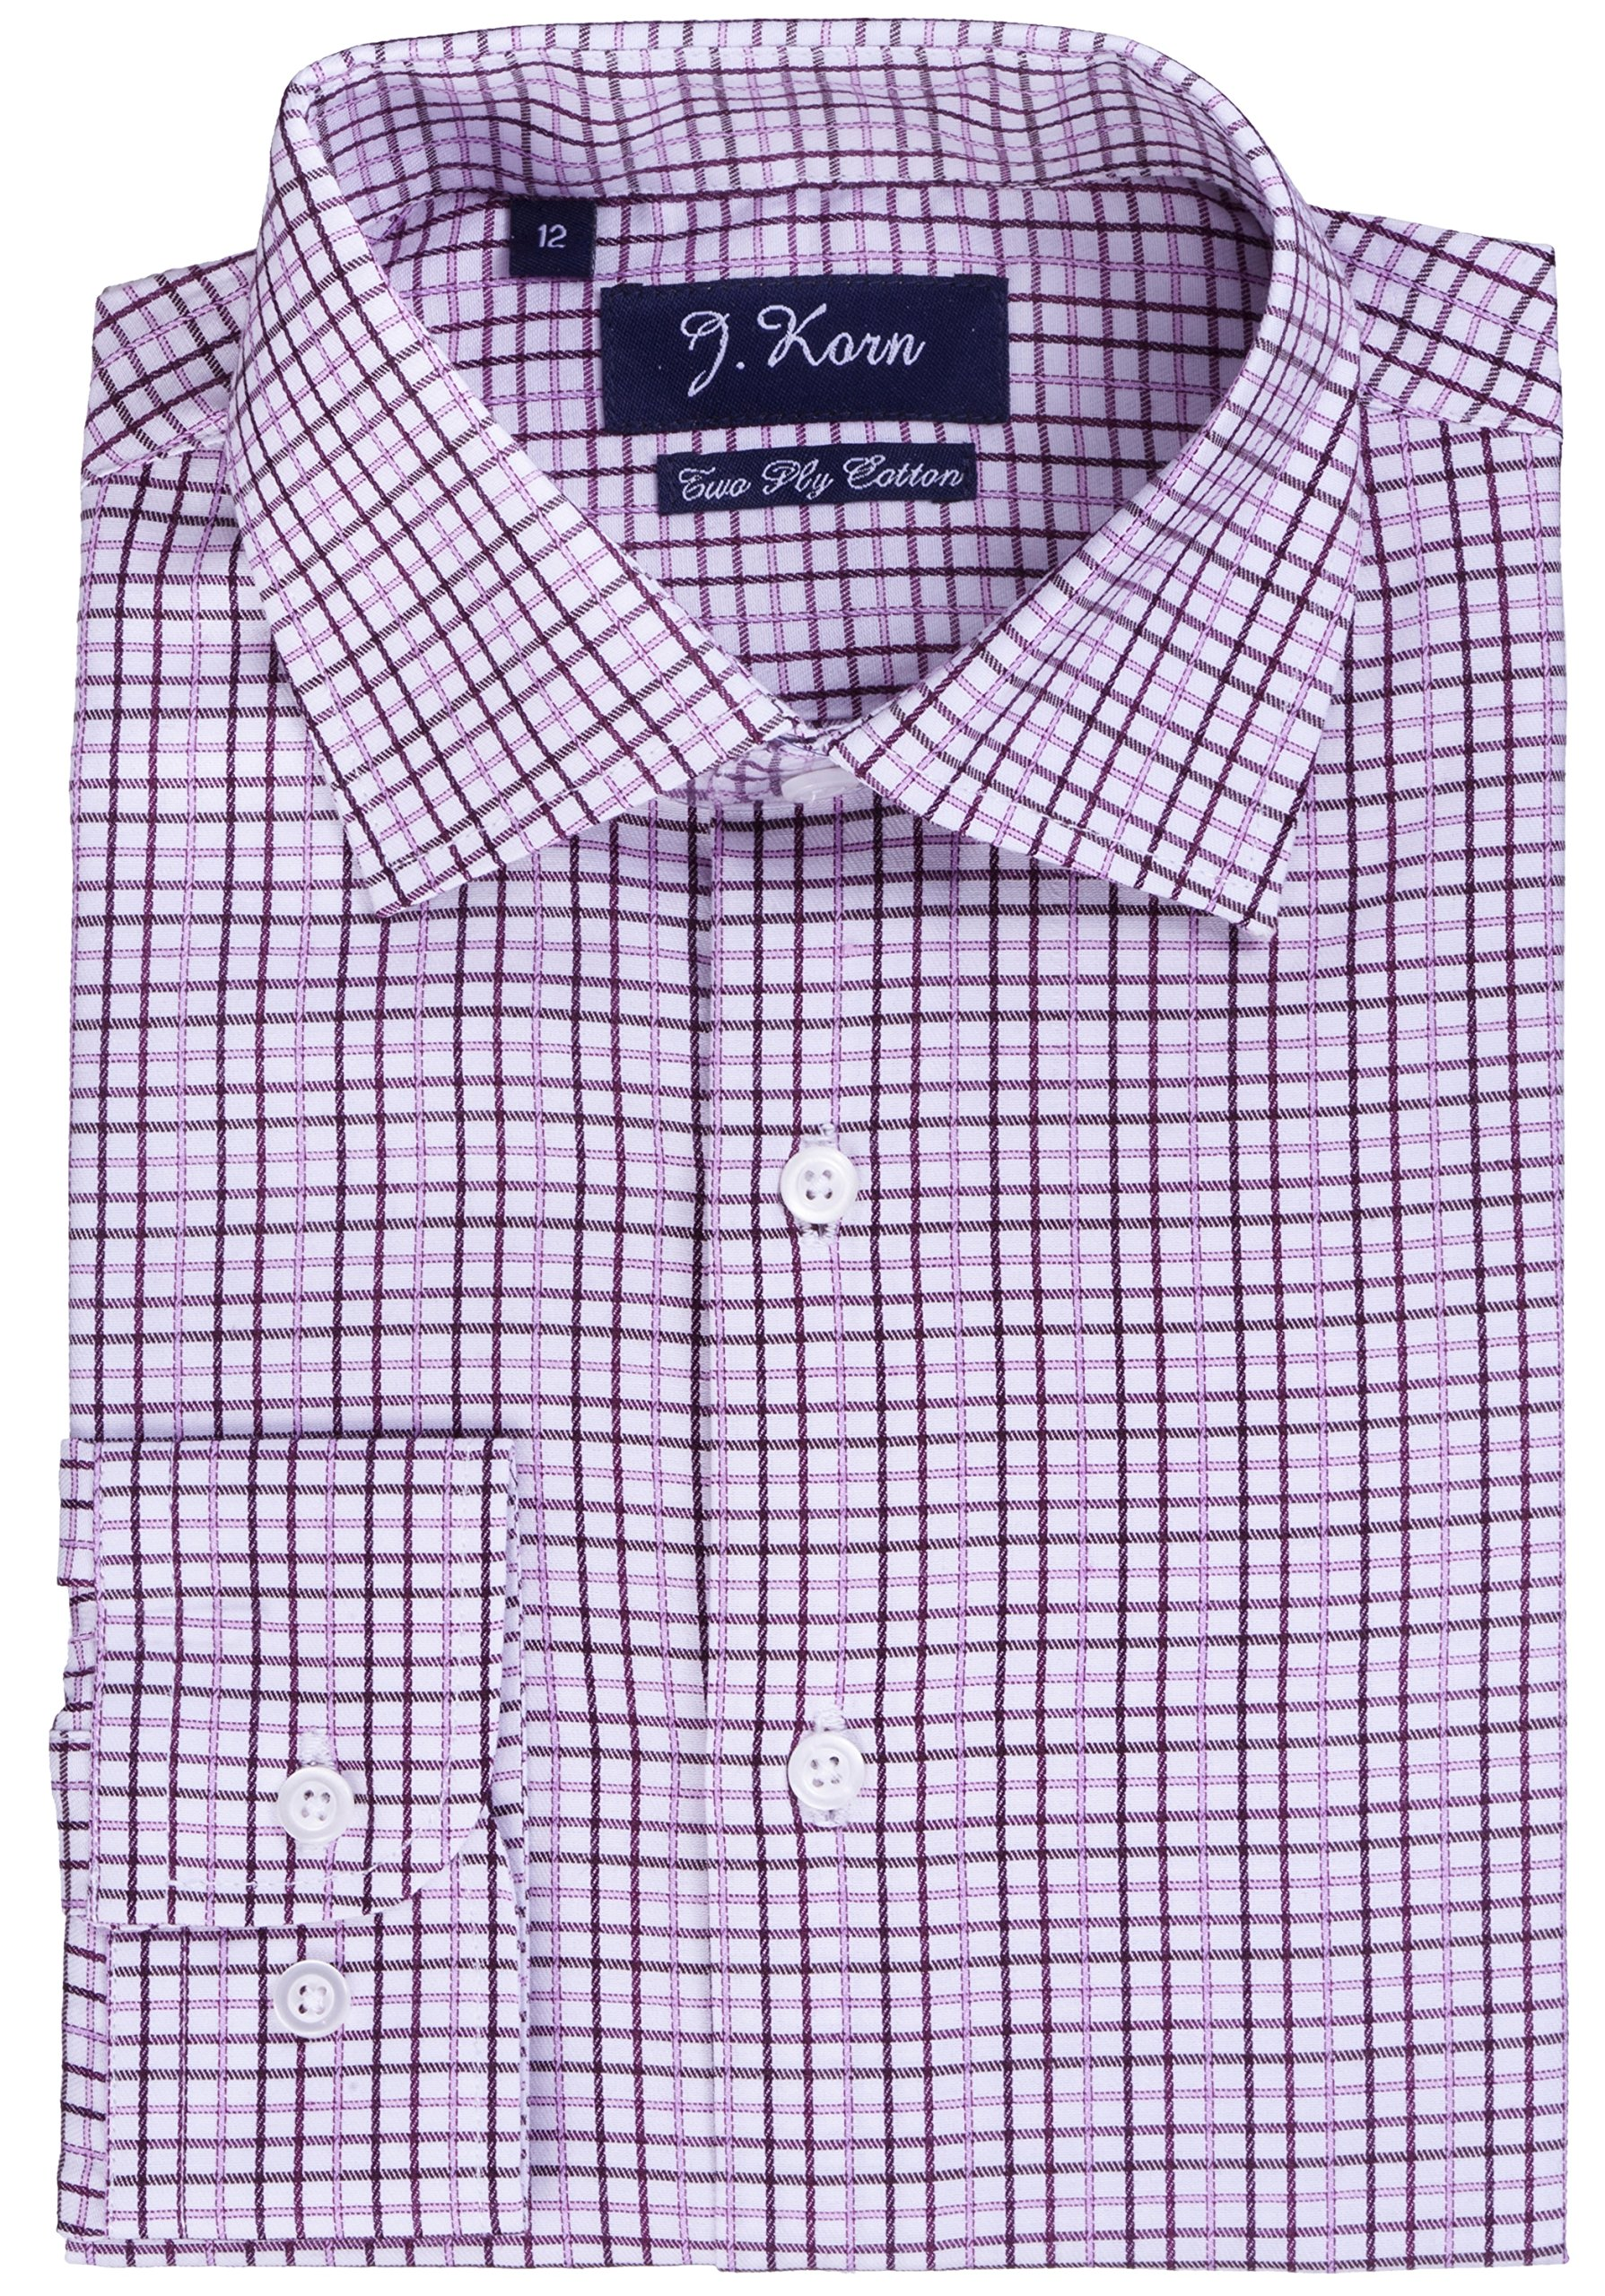 J.Korn Boys Cotton Blend Easy Care Long Sleeve Size 8-20 Dress Shirt FSB13 (20, Lavender Plaid)